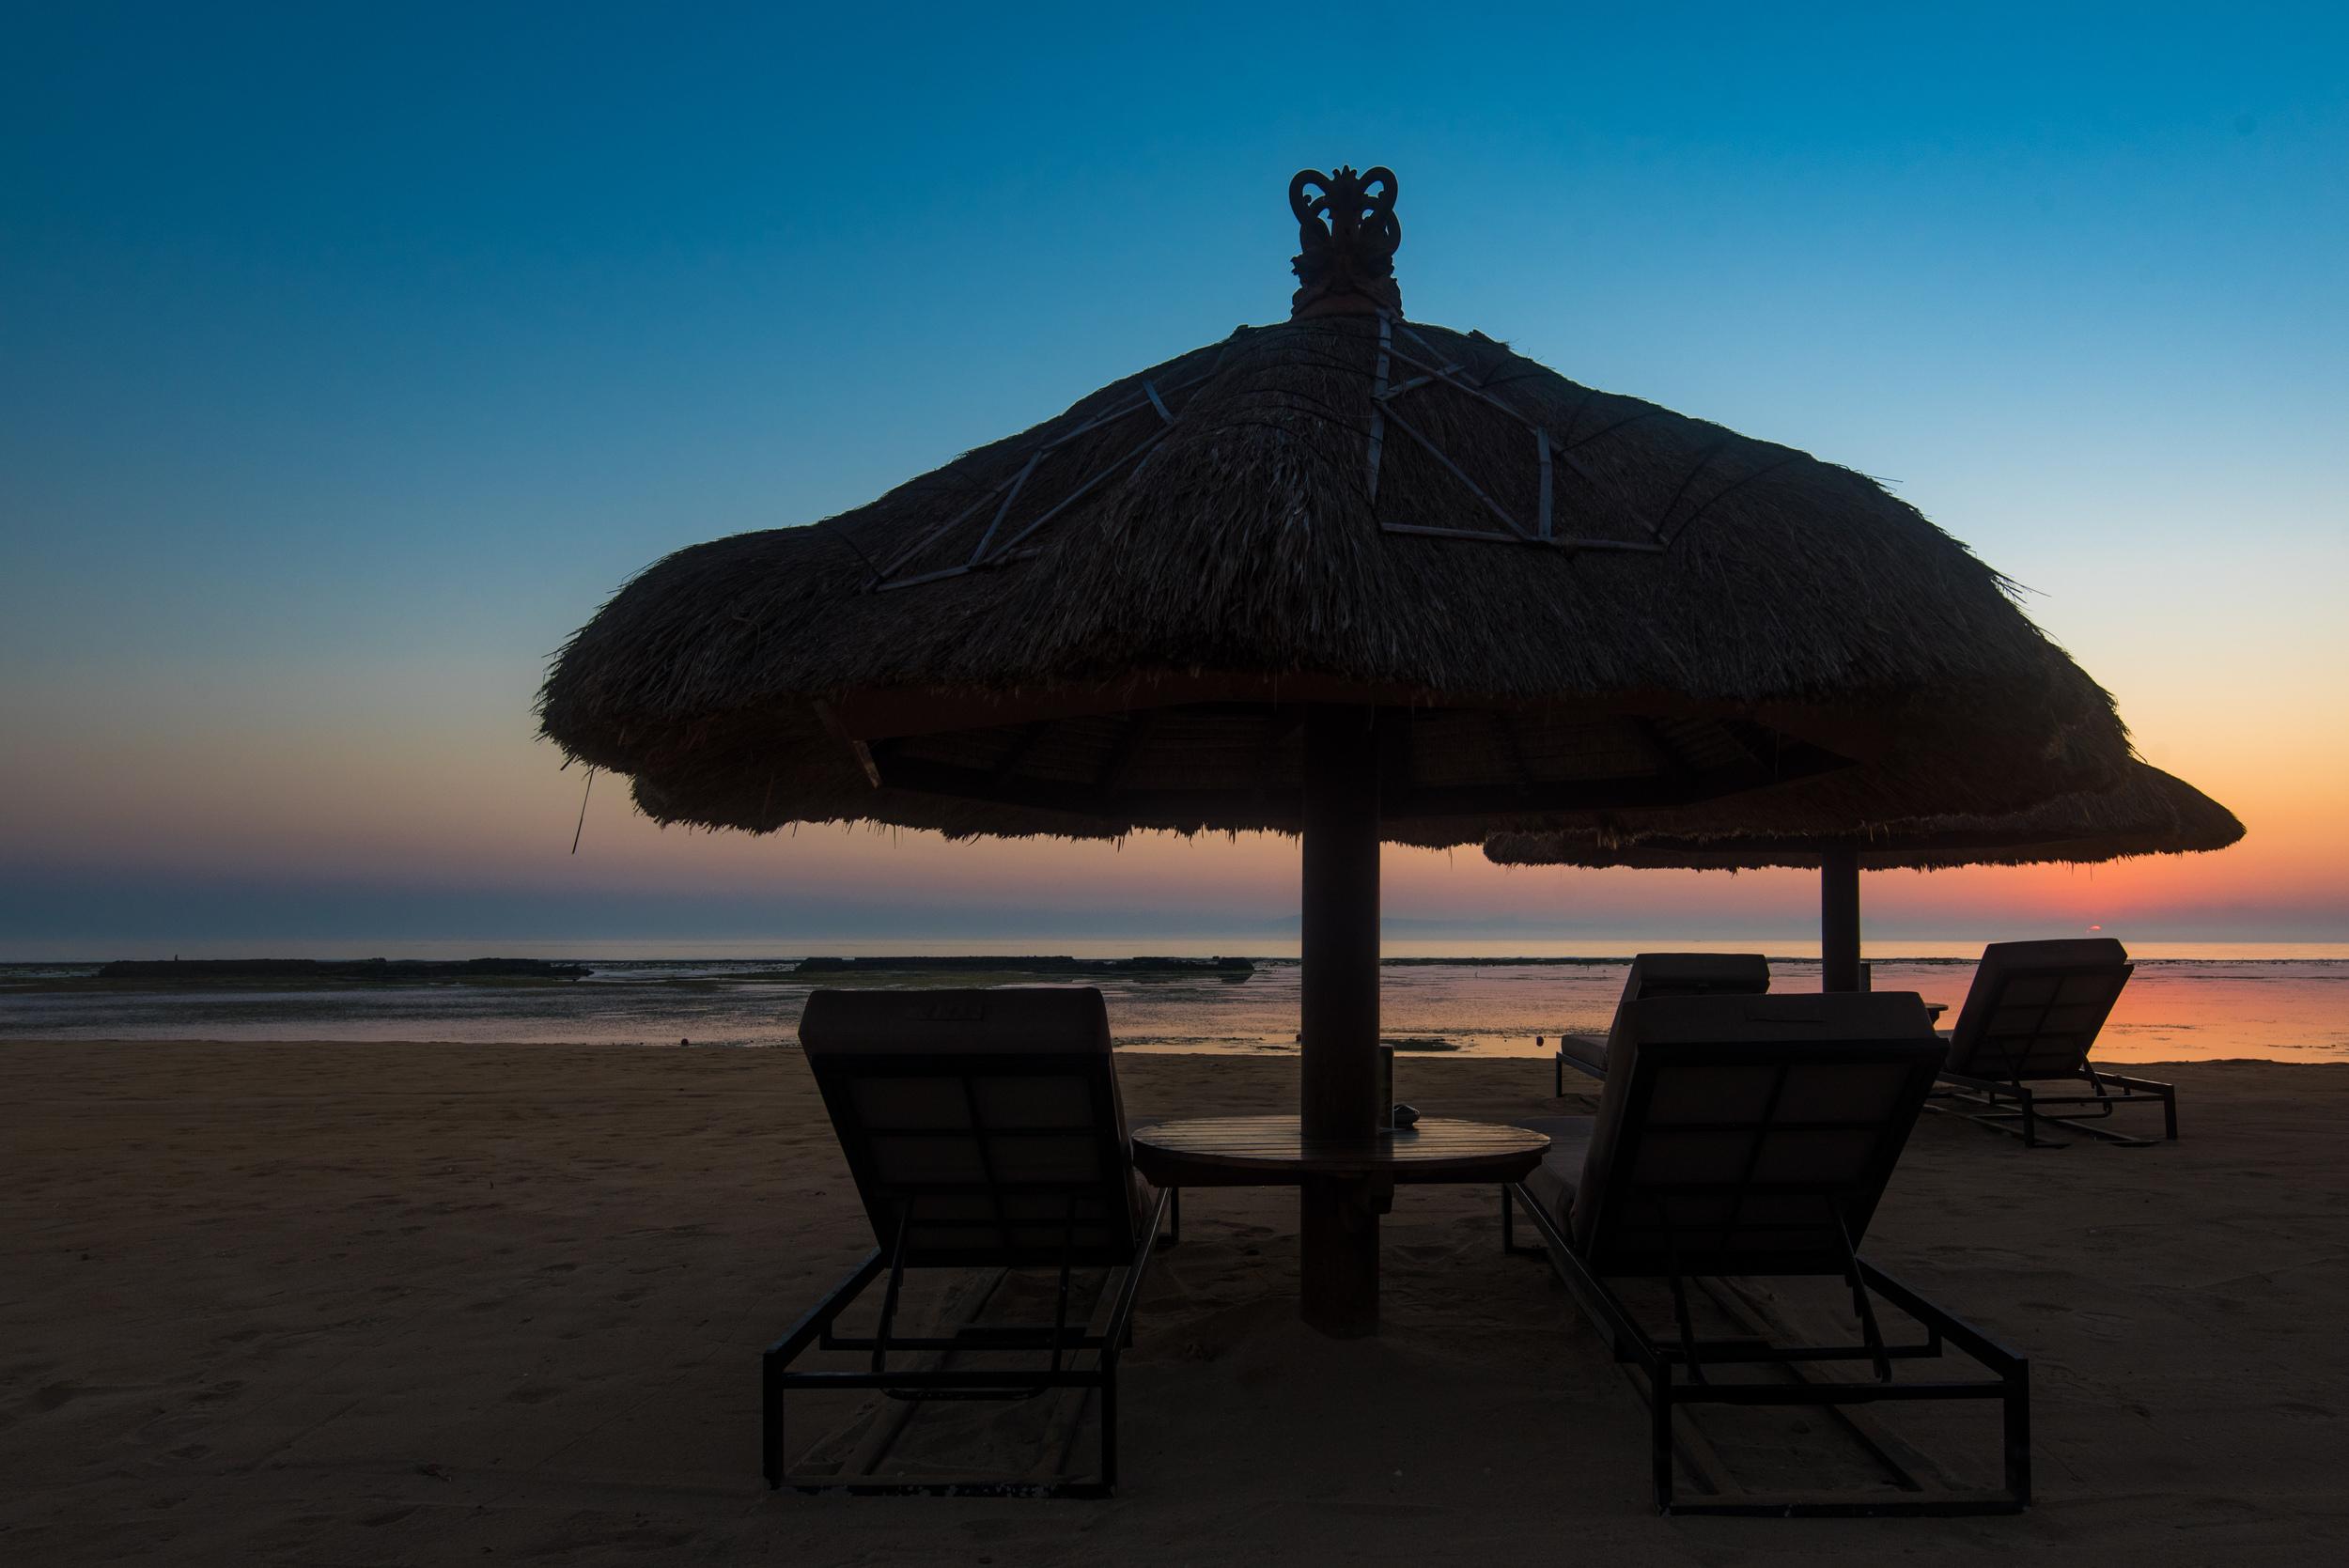 Sunrise at the Beach  Sofitel Bali Nusa Dua Beach Resort